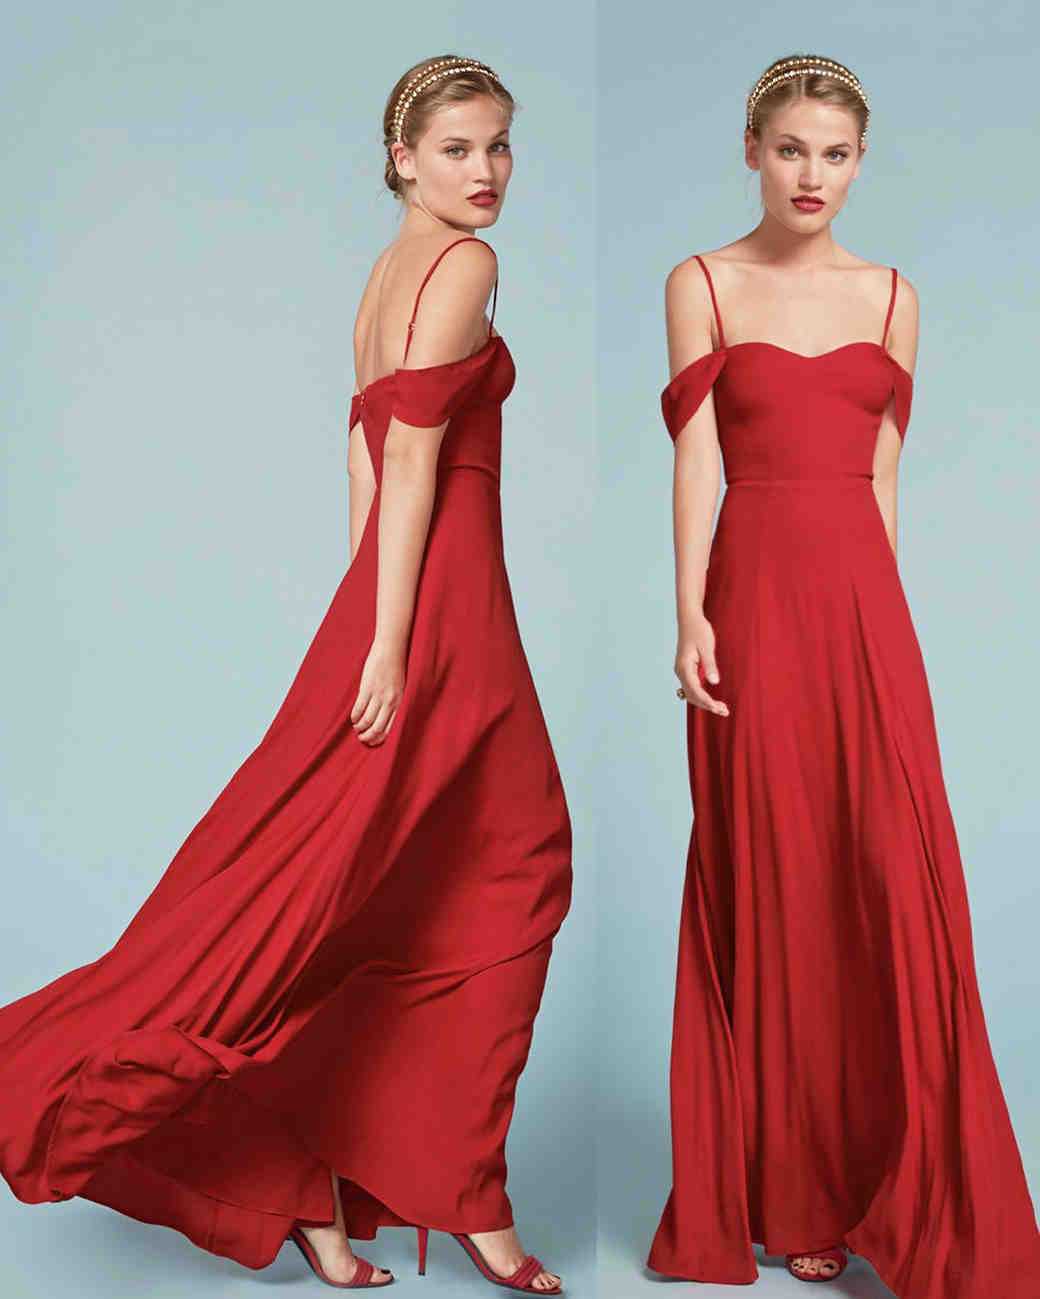 Red Bridesmaid Dresses | Martha Stewart Weddings